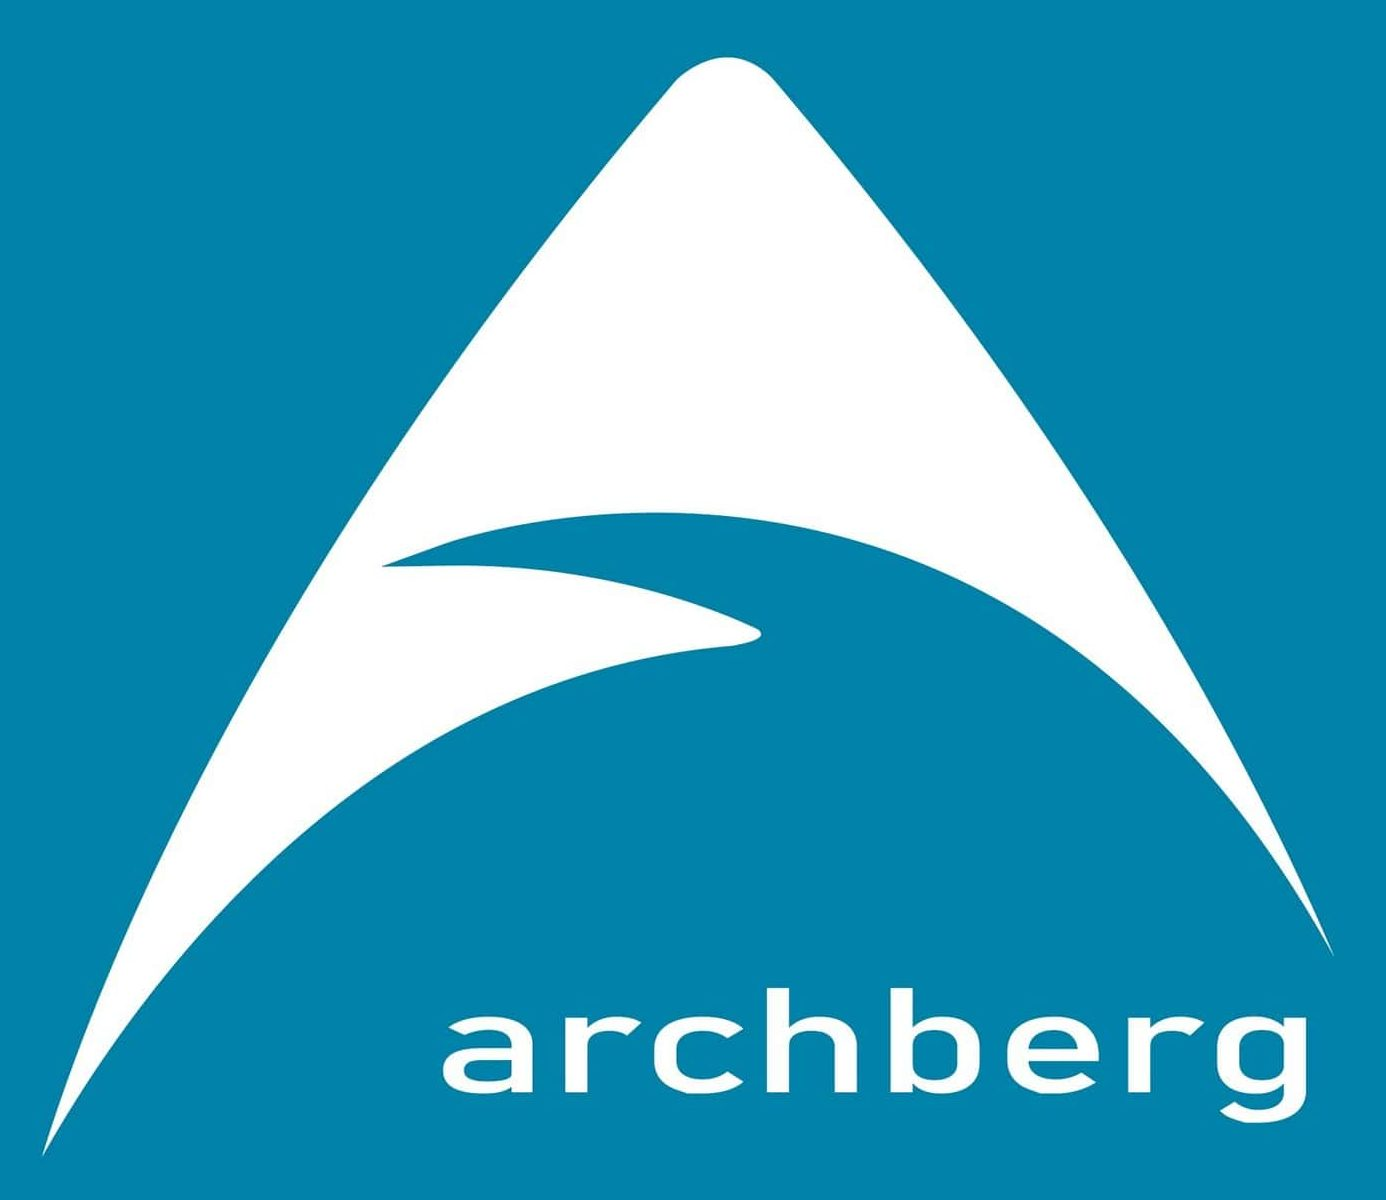 Archberg